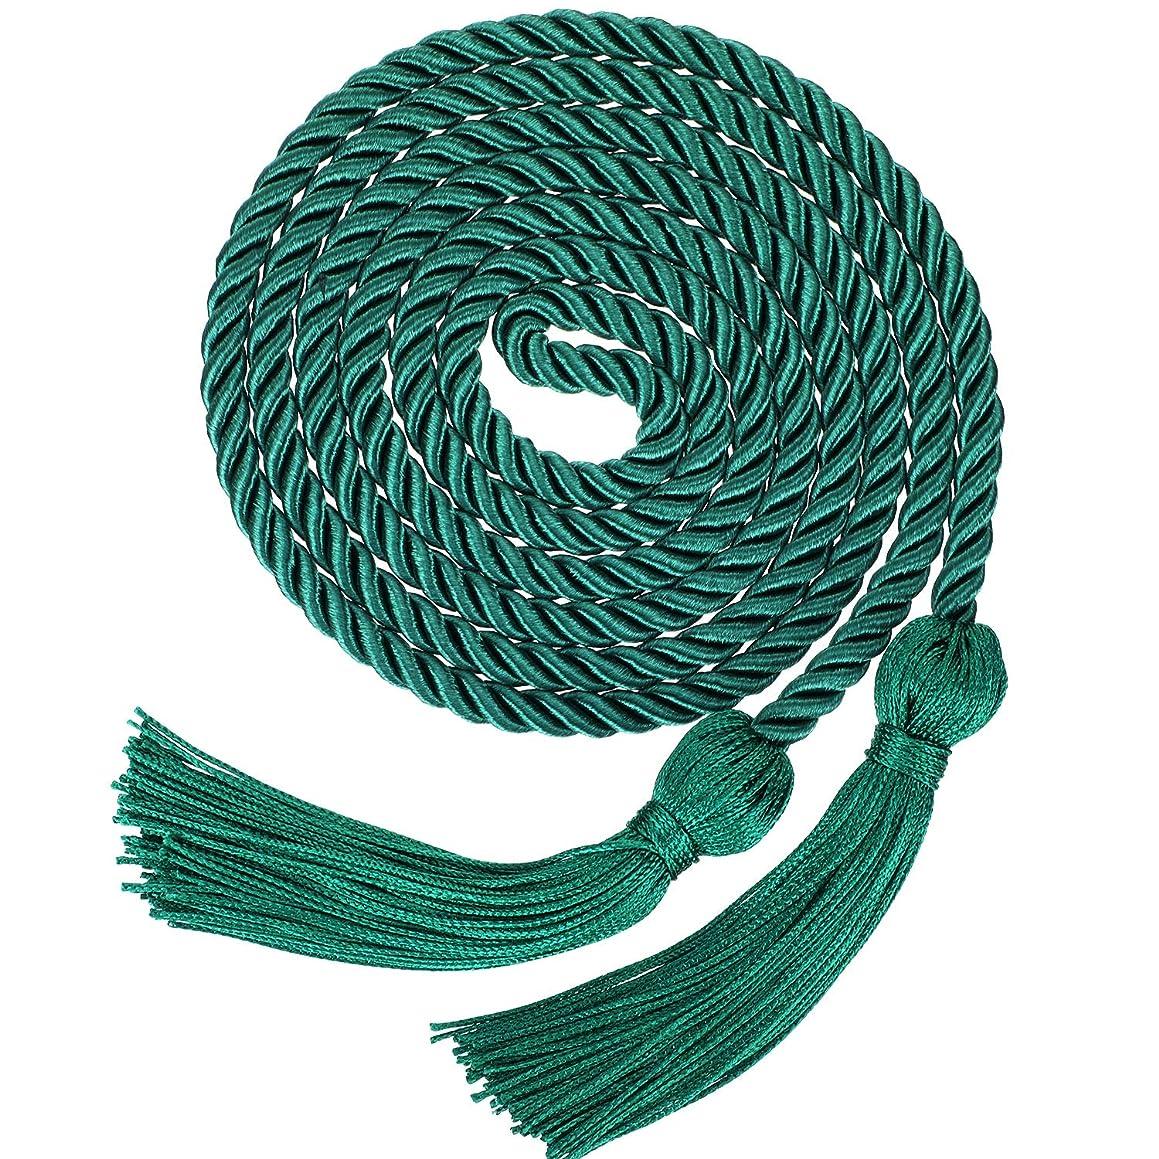 Graduation Honor Cords Tassels Cord Polyester Yarn Honor Cord for Bachelor Gown for Graduation Students (Green)